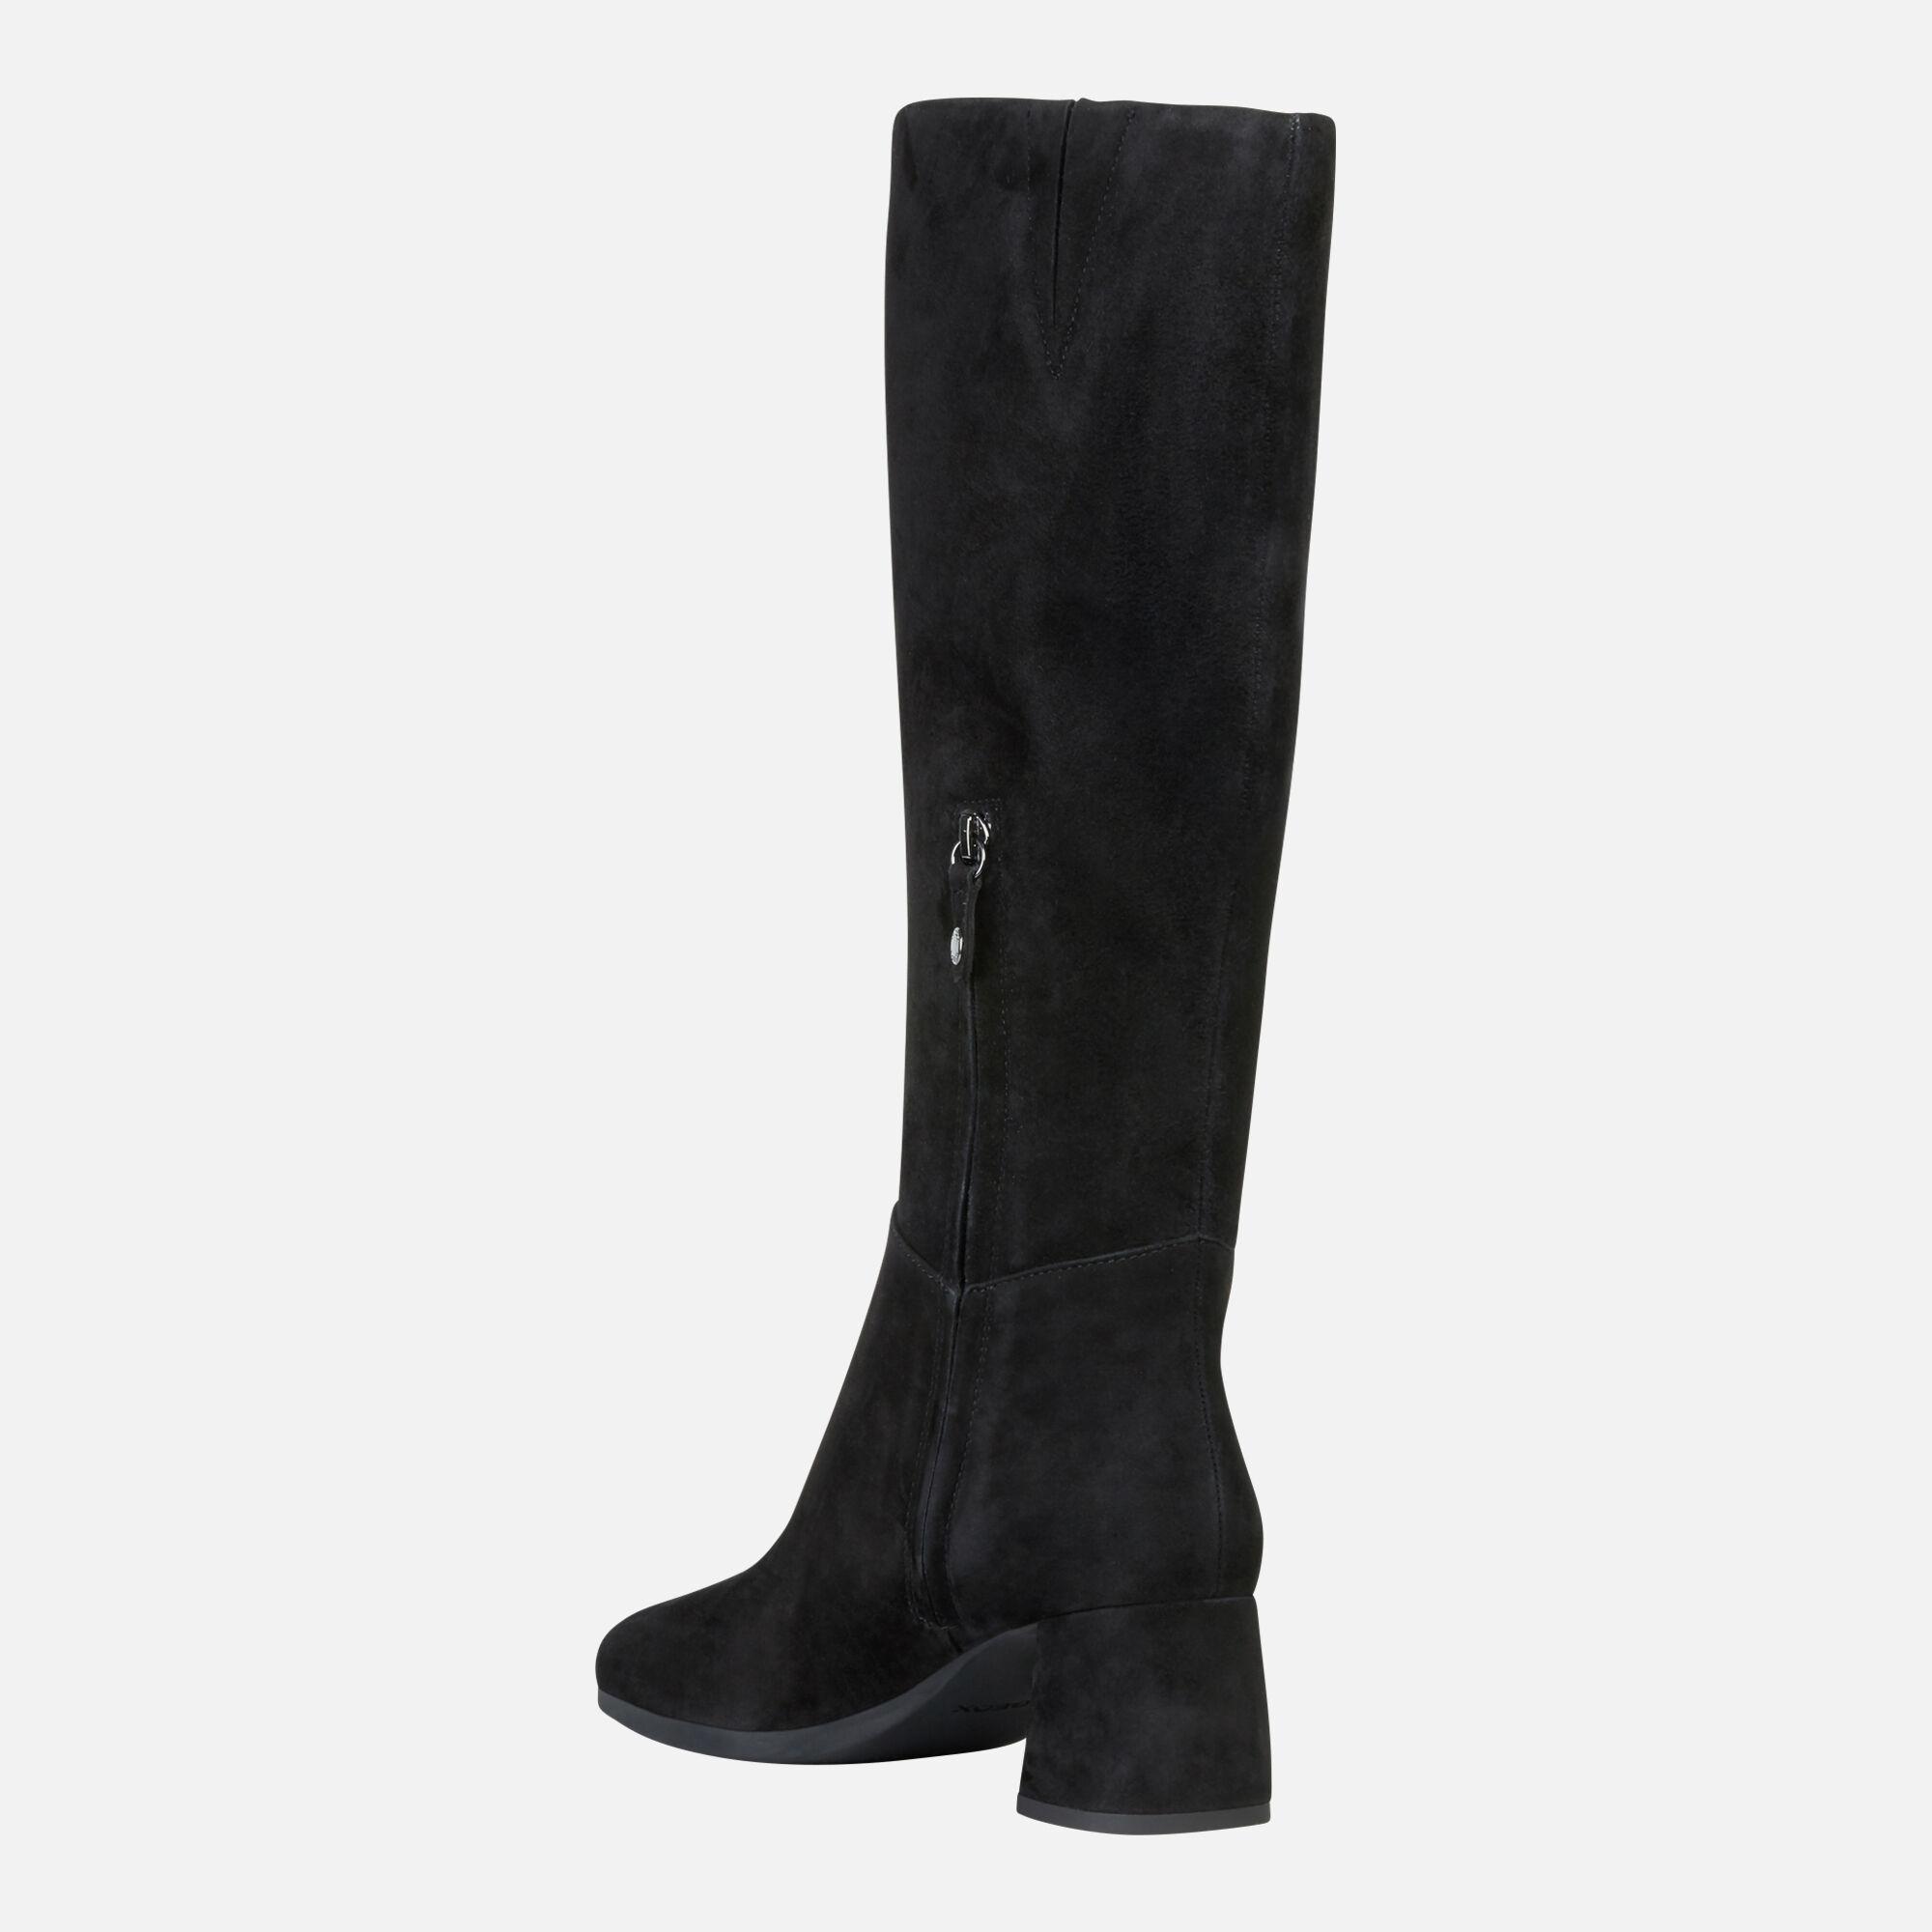 Geox CALINDA MID Donna: Stivali Con Tacco Neri | Geox ®